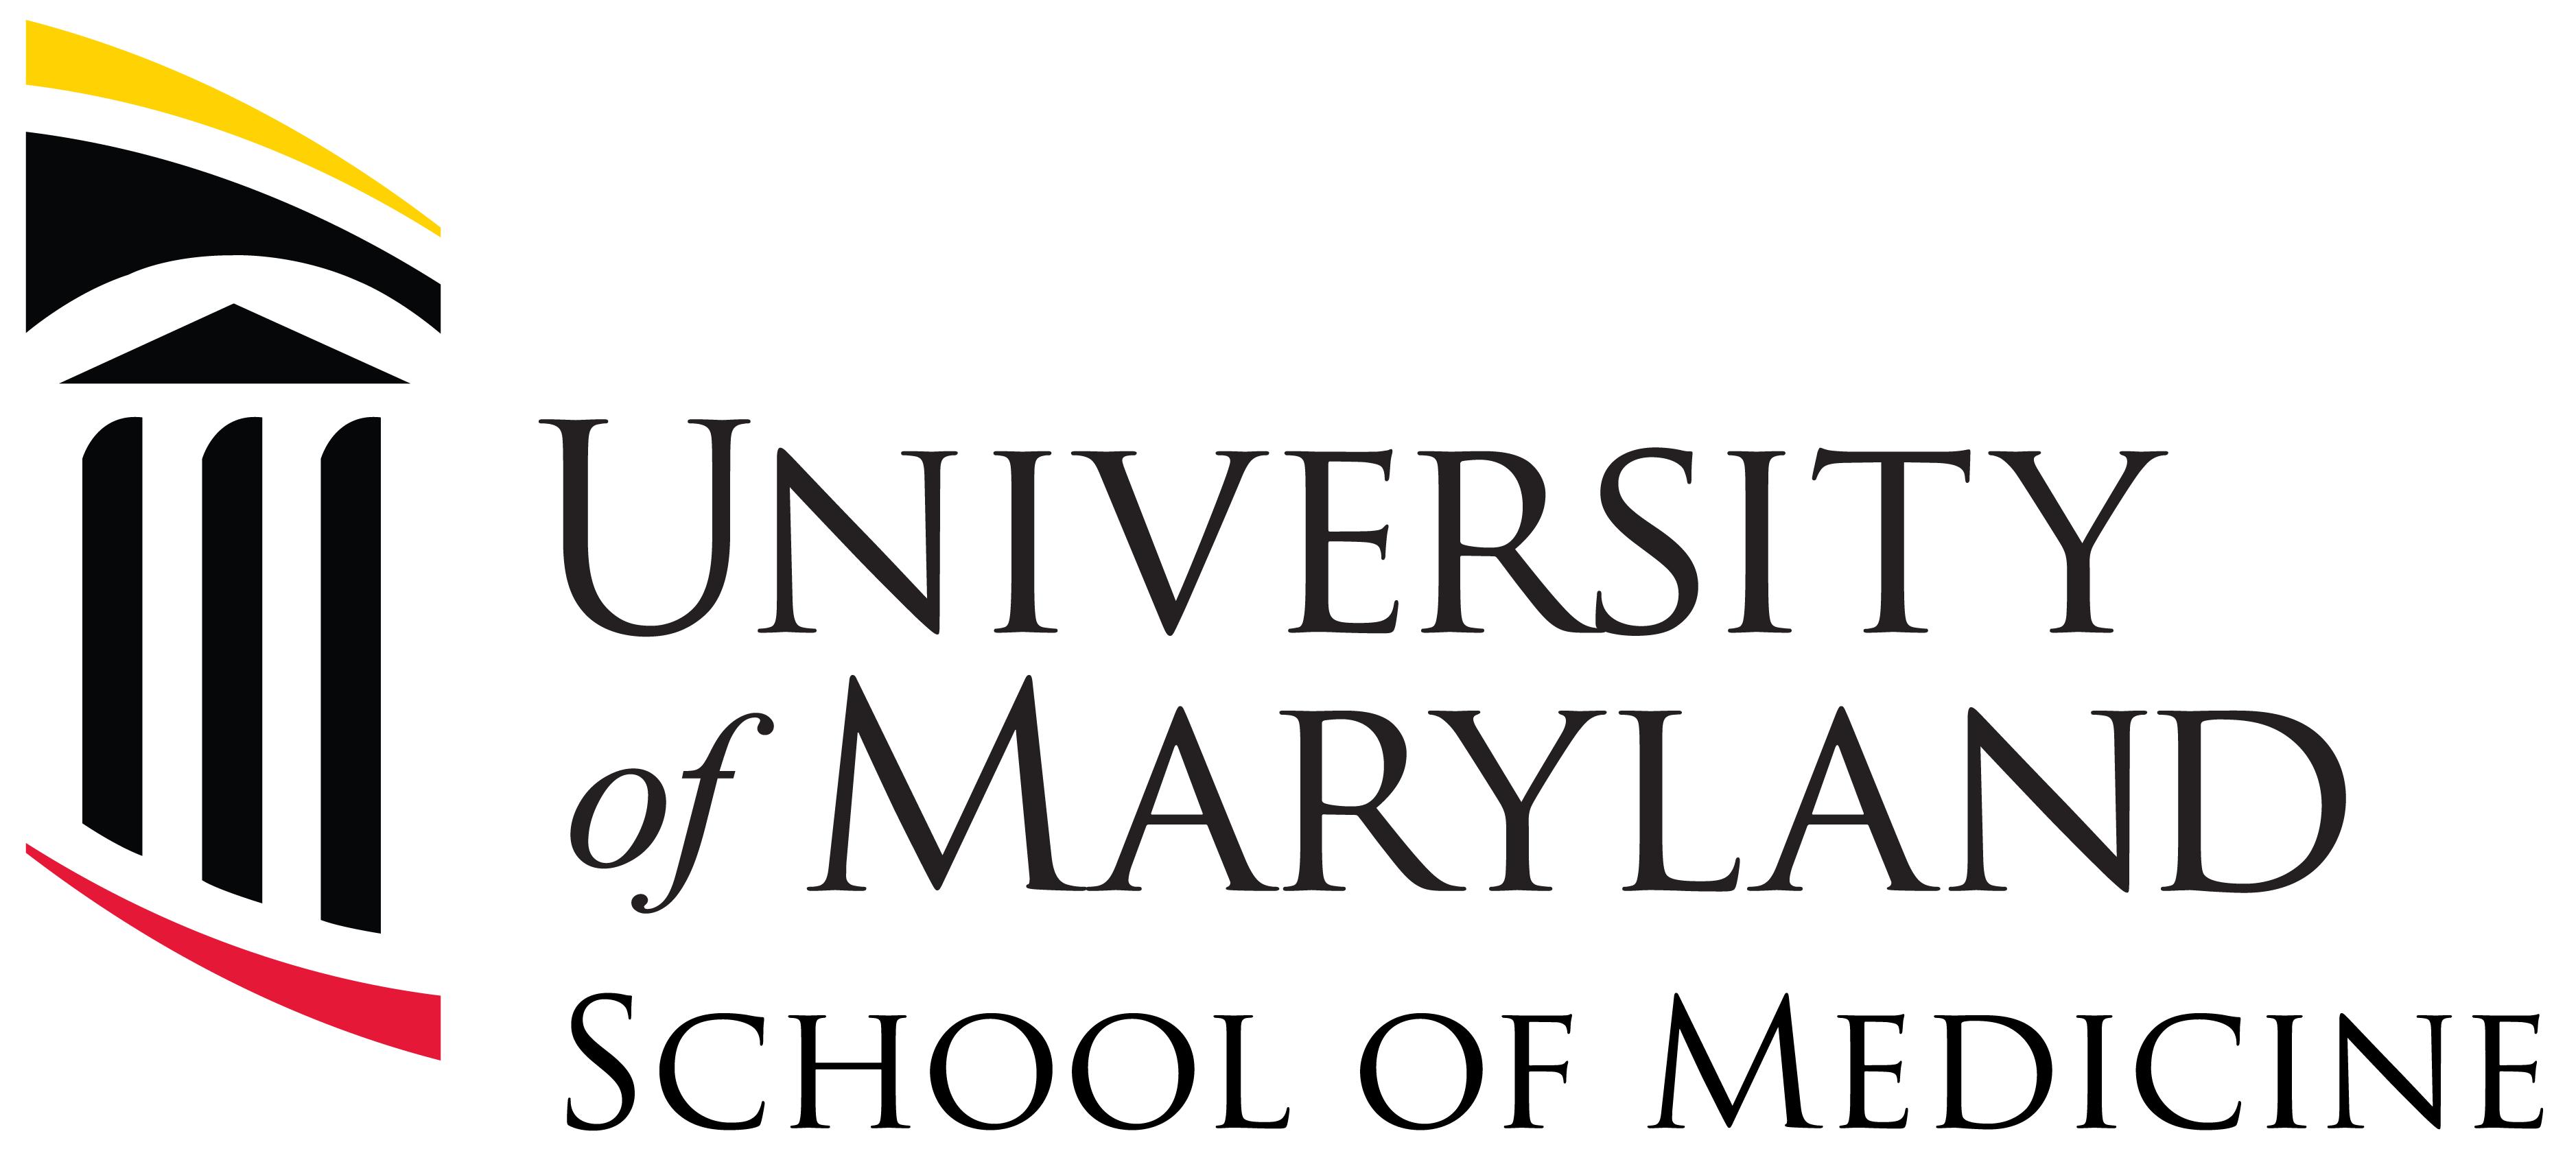 University of Maryland School of Medicine logo | Medicine logo, School of  medicine, I love mondays